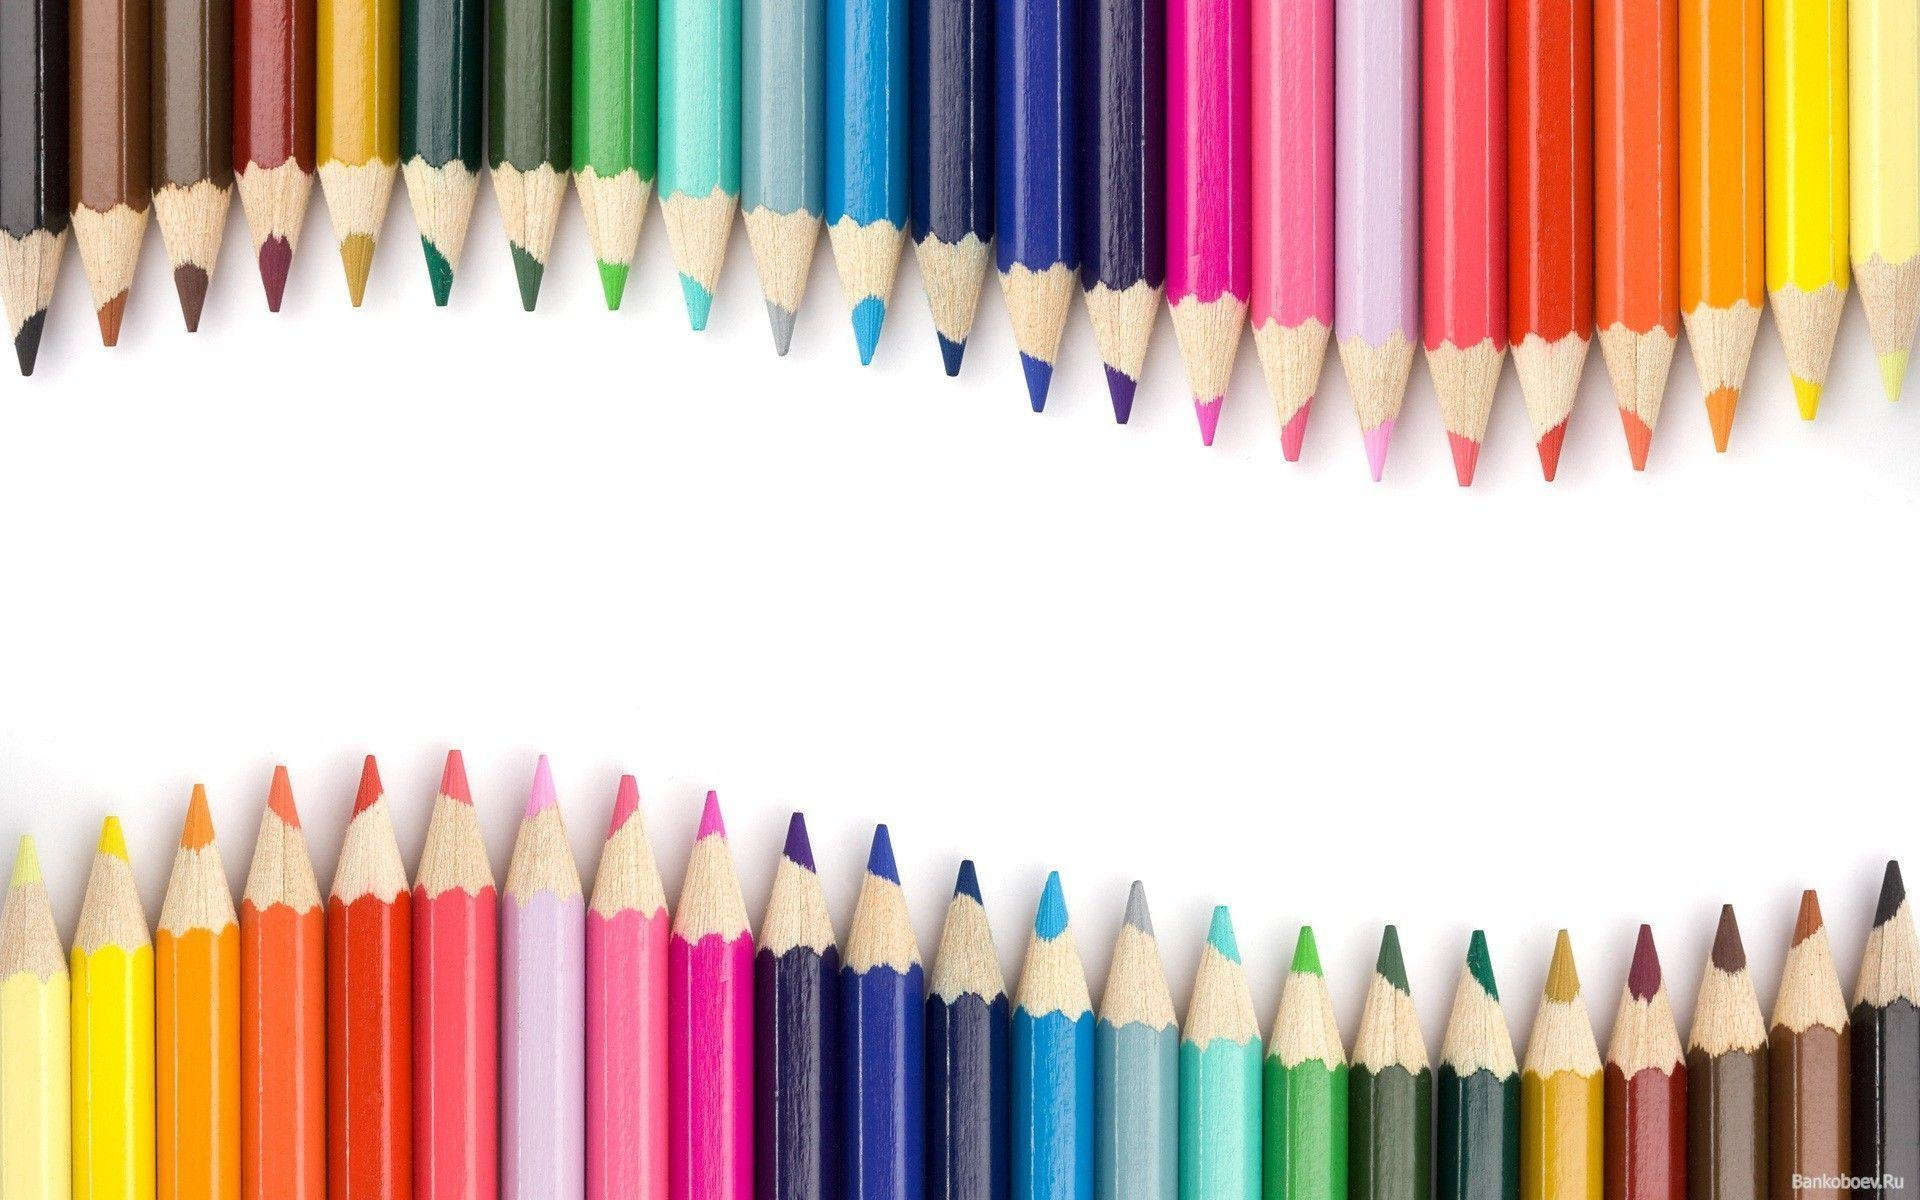 Crayon Wallpapers - Wallpaper Cave